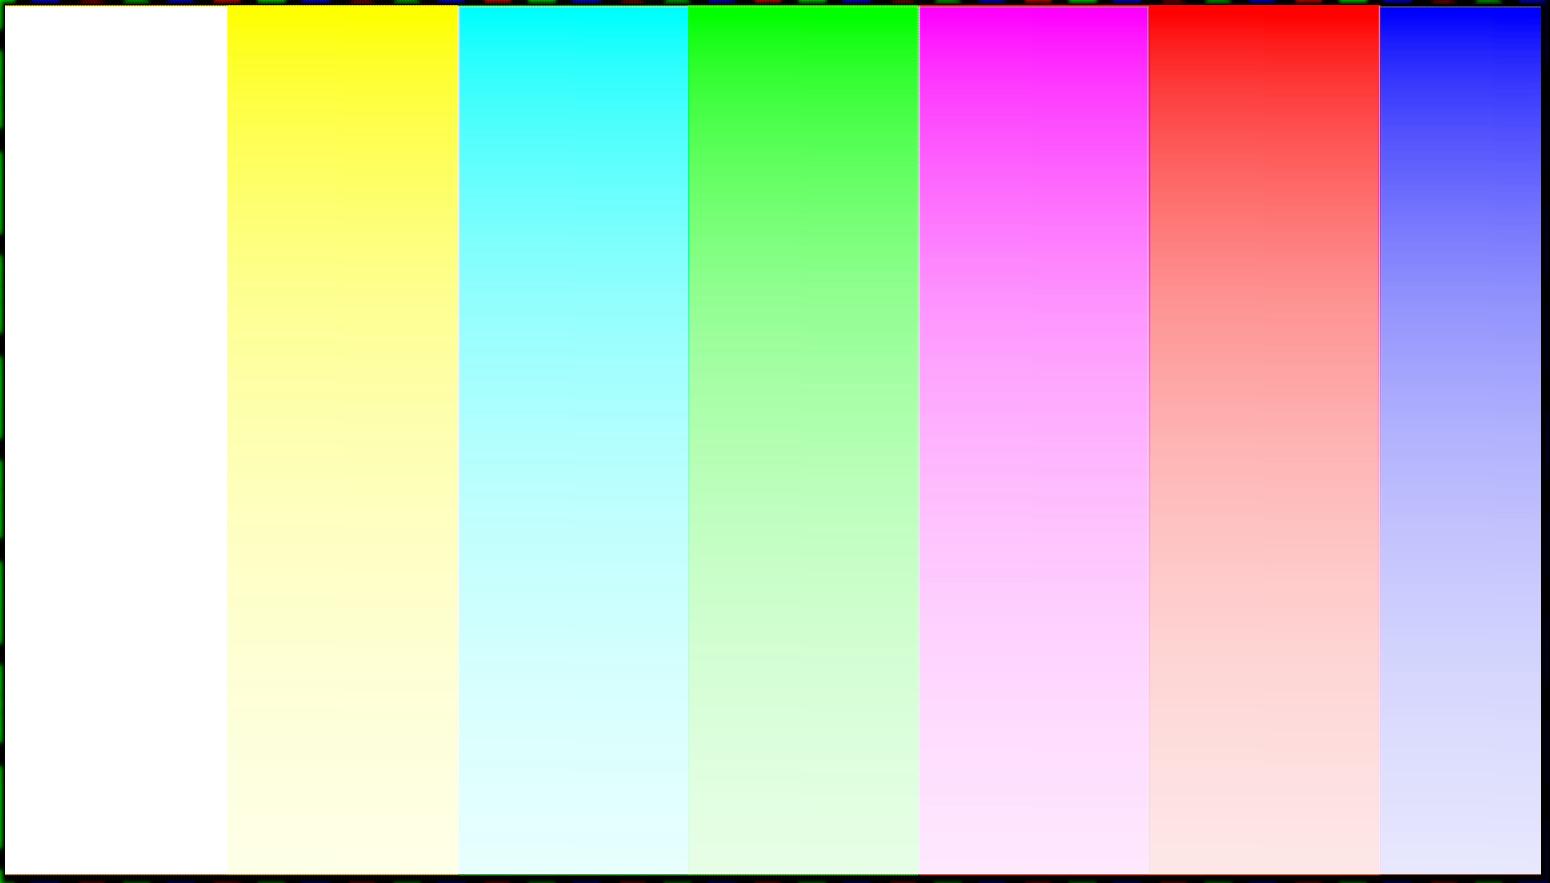 Linux/TMS320DM365: Bayer-YUV 12 bit parallel: Not using MSB's